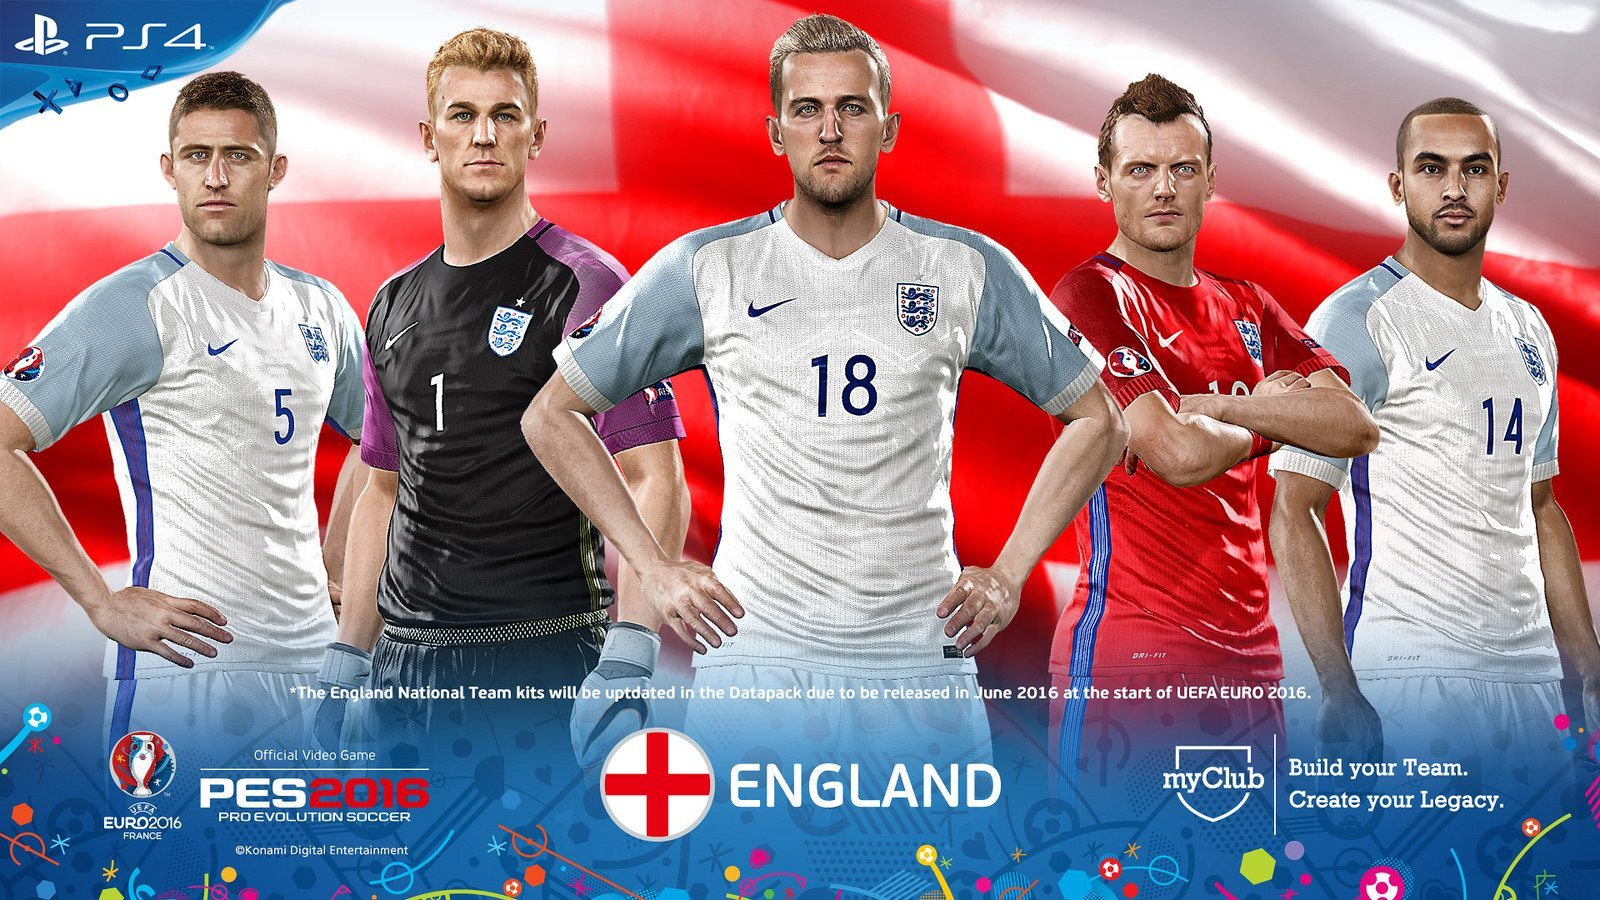 PES 2016 – UEFA Euro 2016 England